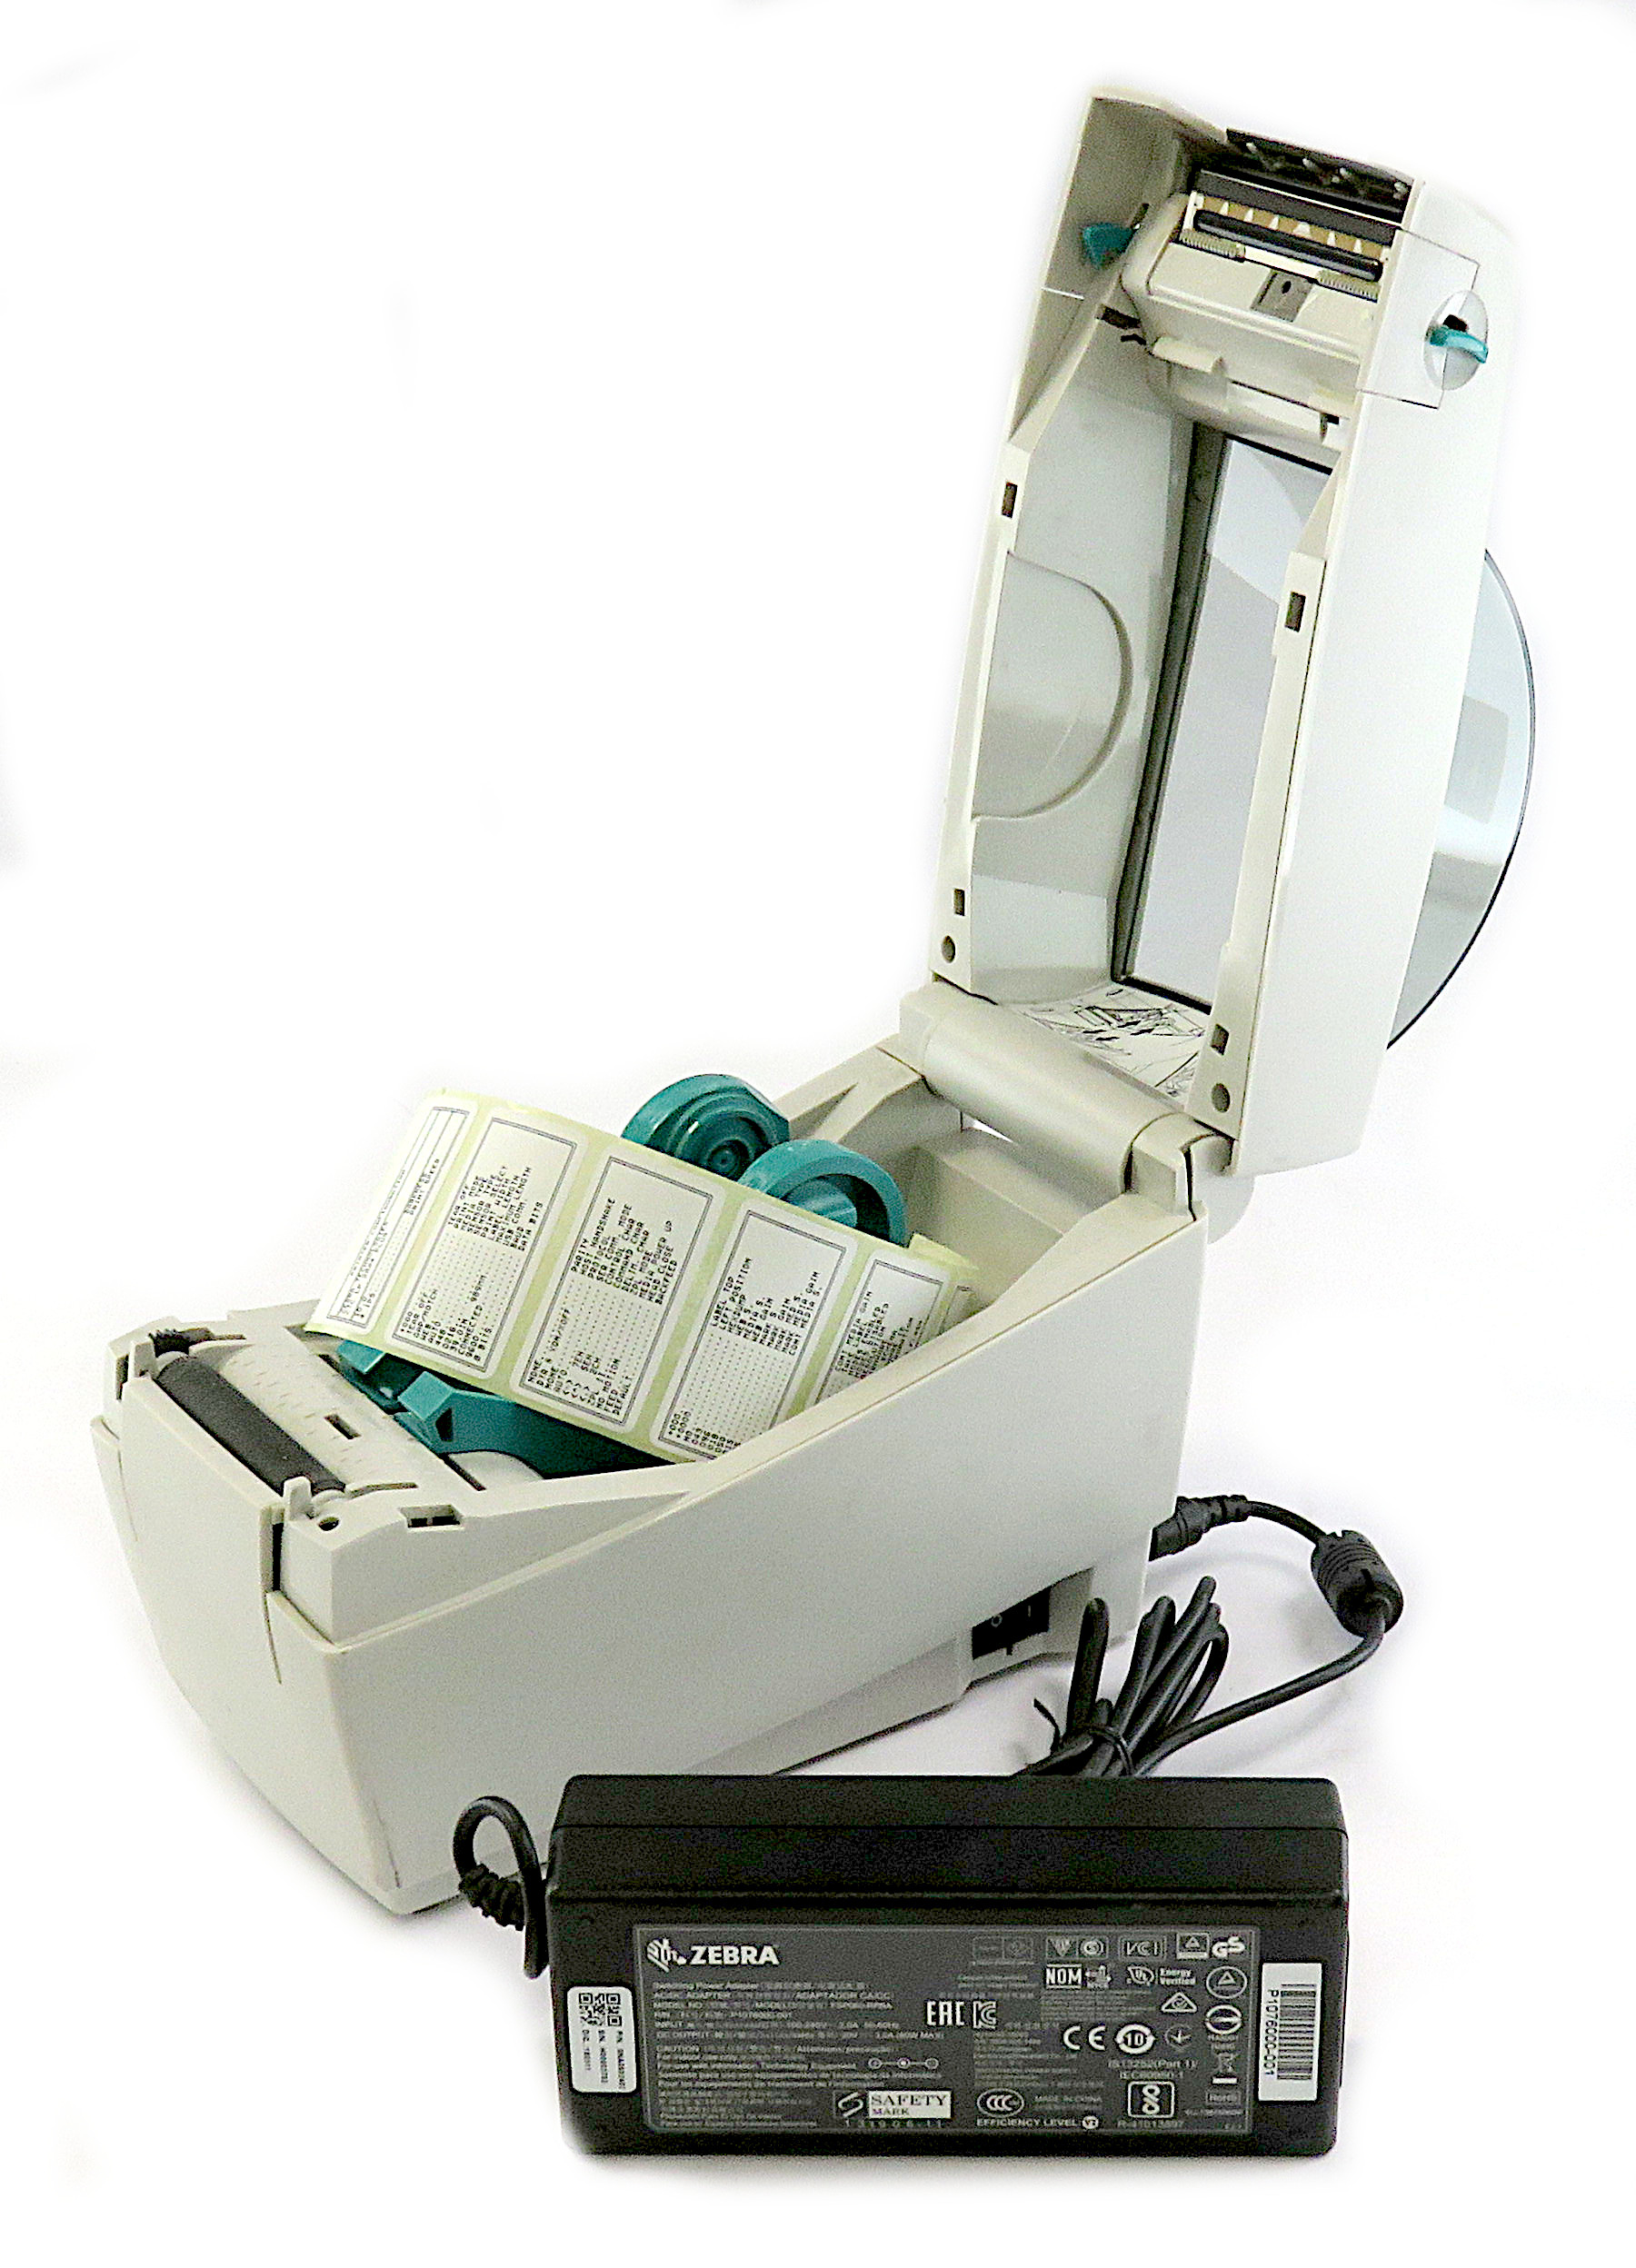 Zebra LP2824 Plus USB/Serial Interface Thermal Label Printer 282P-201120-000